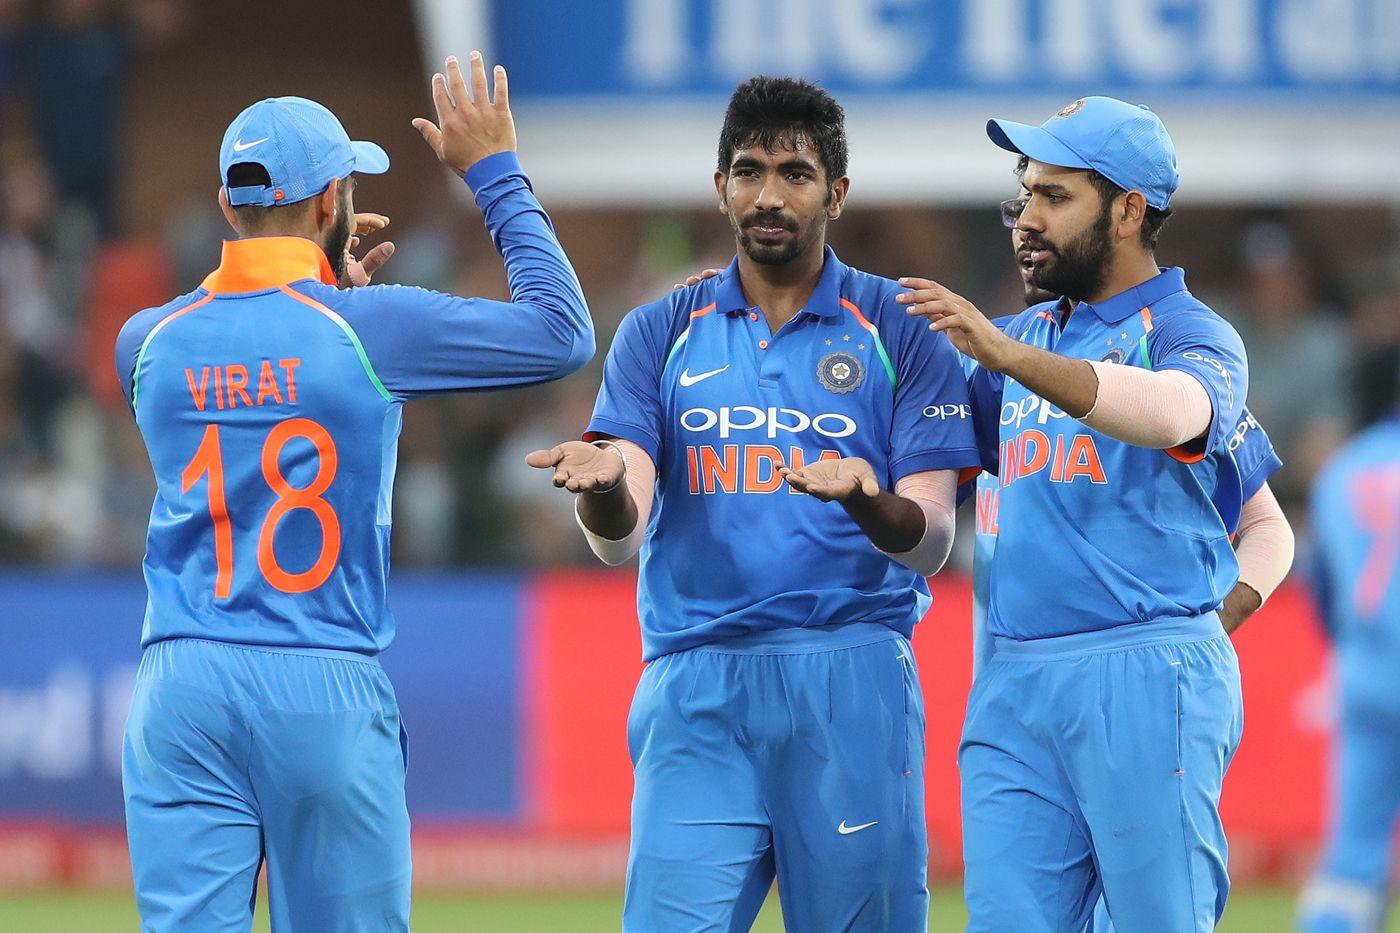 India Recall Jasprit Bumrah and Bhuvneshwar Kumar For Last